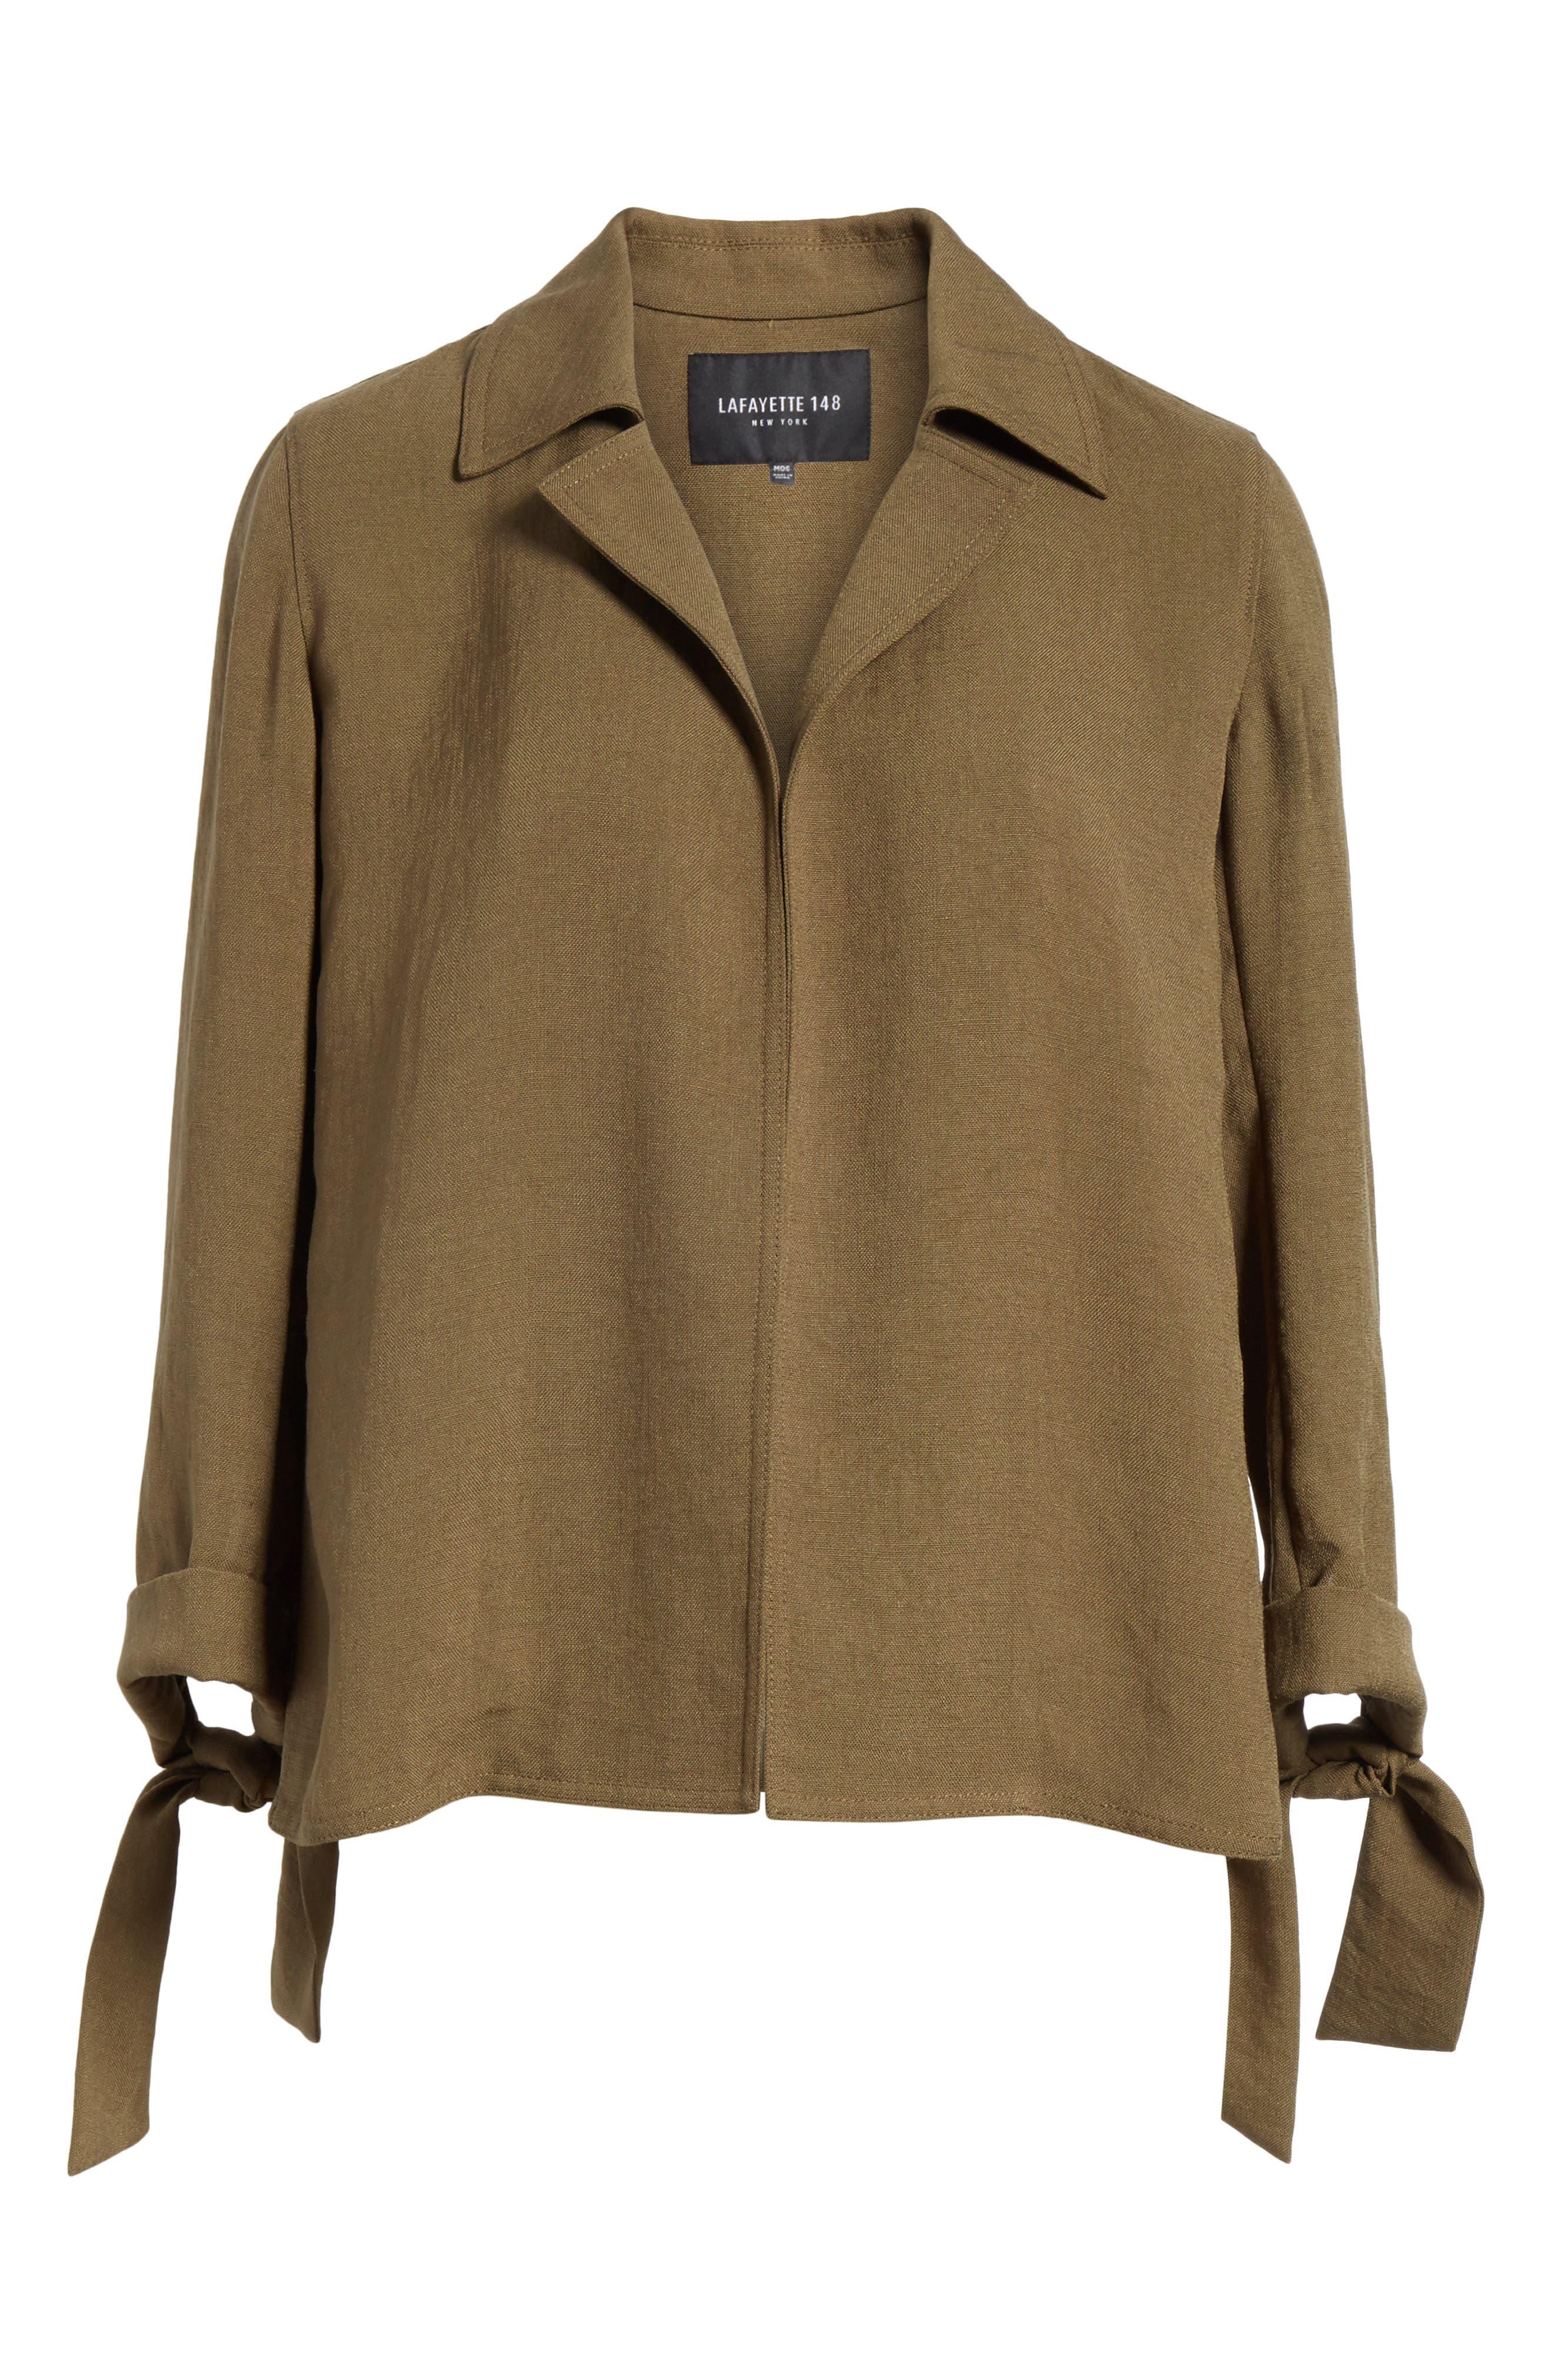 Grant Altruistic Cloth Jacket,                             Alternate thumbnail 5, color,                             342